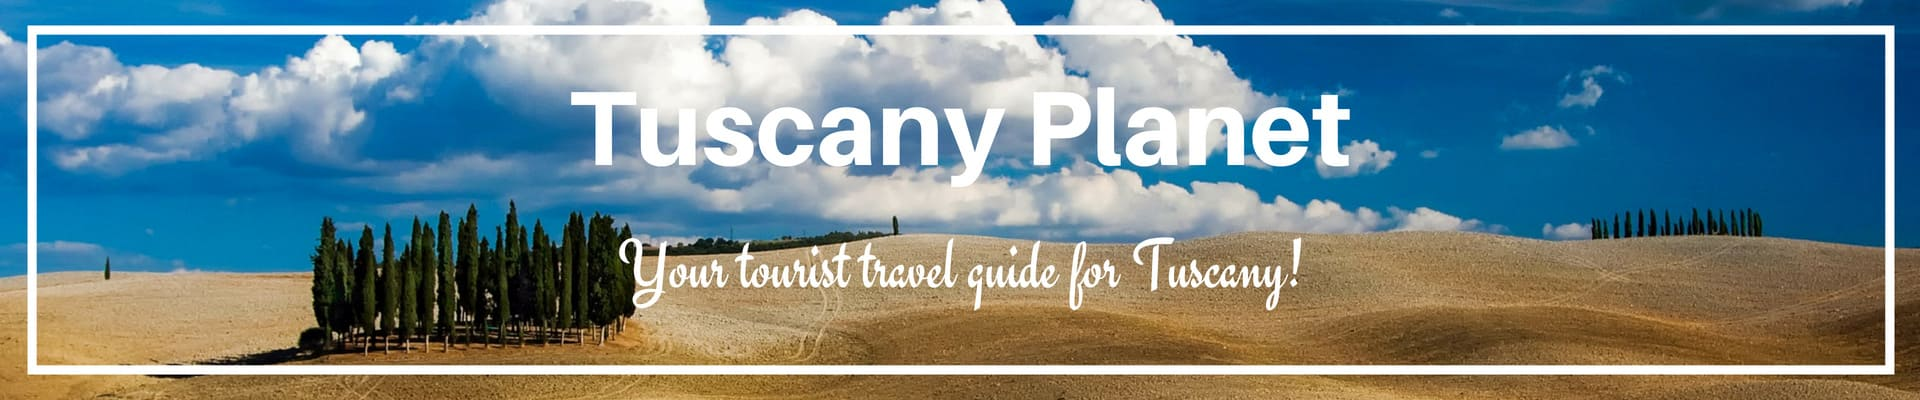 Tuscany Planet